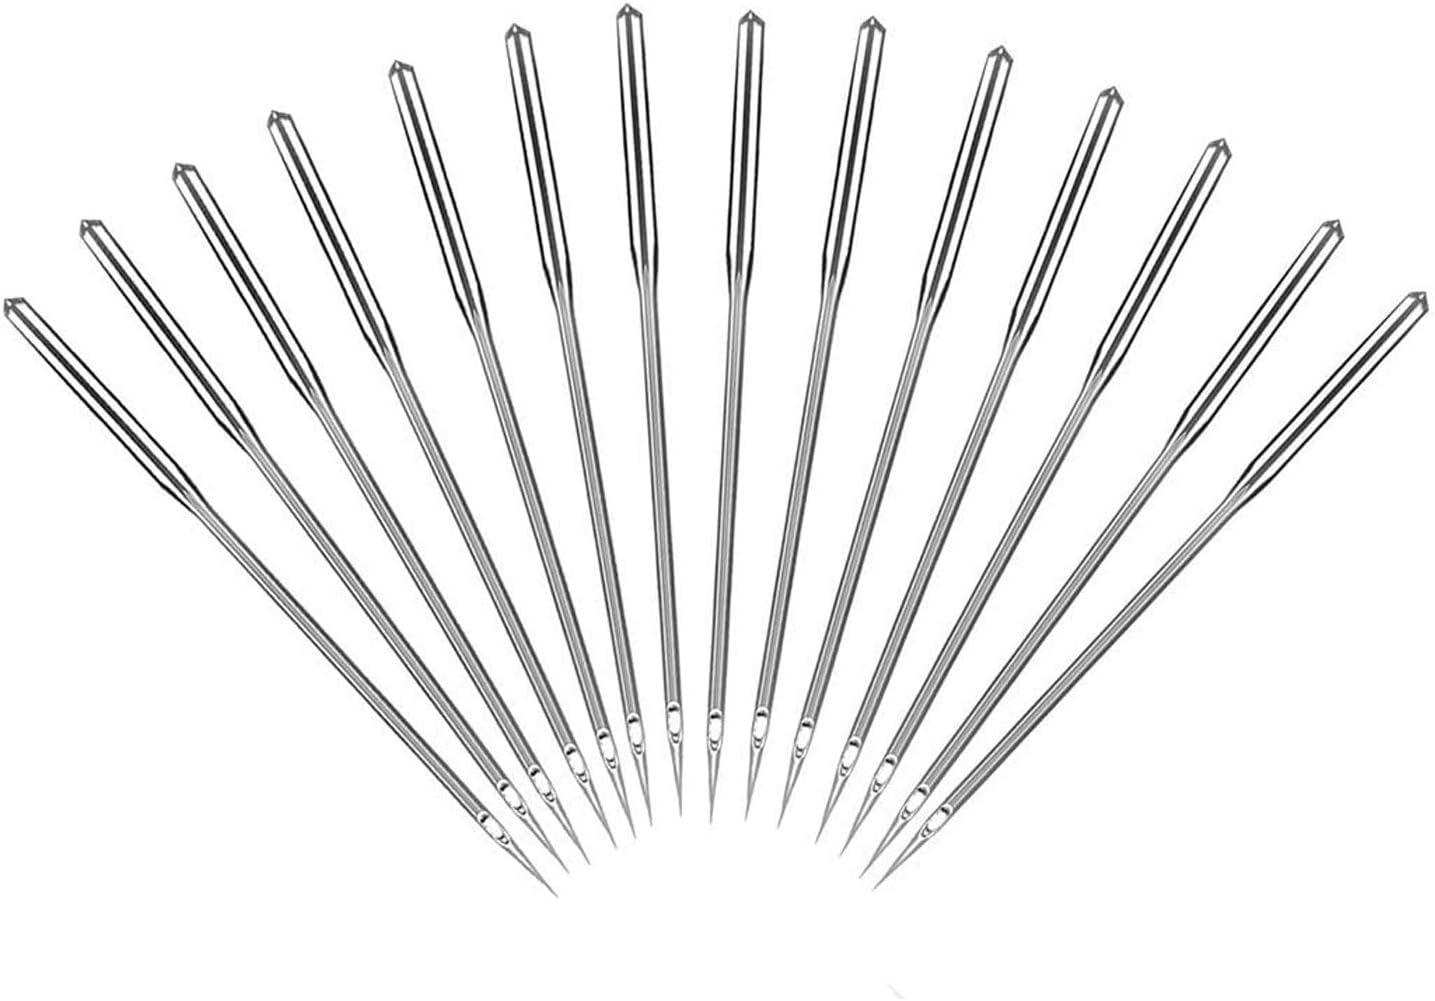 LIVINO Sewing Machine Needles, Pack of 50 Universal Sewing Machine Needles with Sizes 65/9, 75/11, 100/16, 110/18 & 90/14 Sewing Machine Needles, 10 Pcs per Size